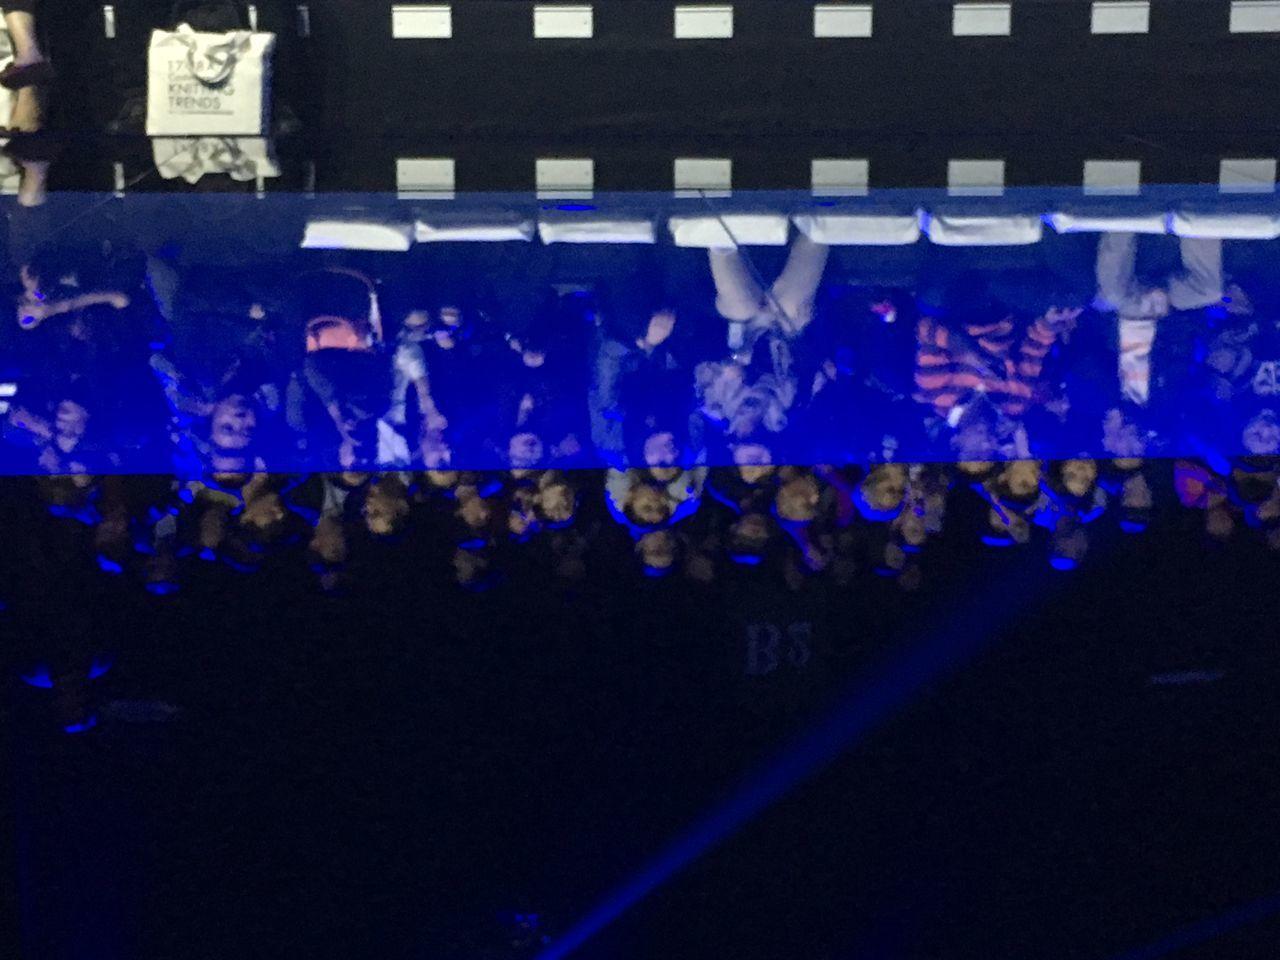 blue, indoors, night, hanging, illuminated, no people, close-up